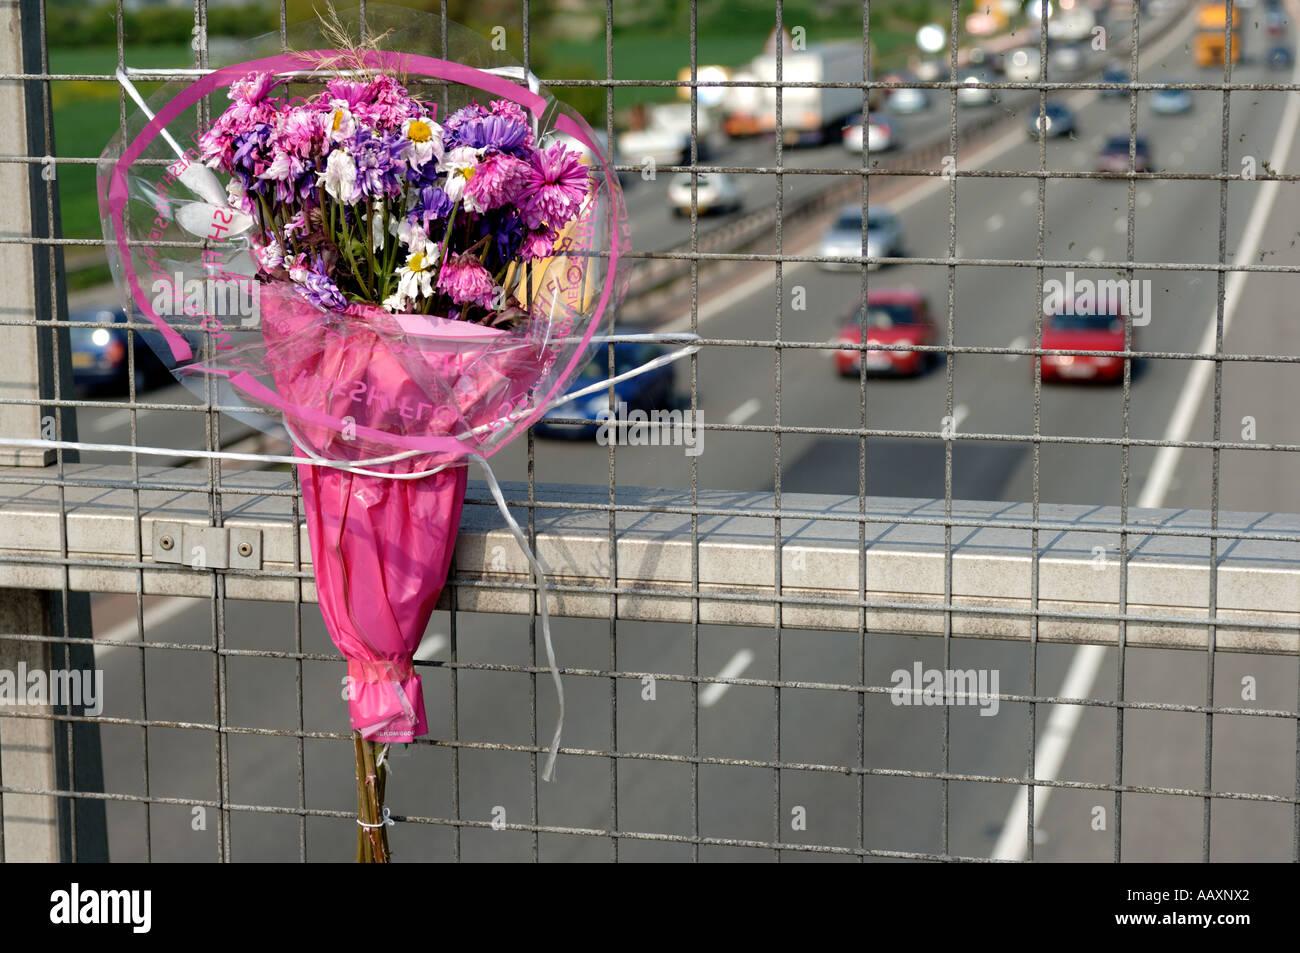 Flower tribute, M56, Cheshire England UK - Stock Image